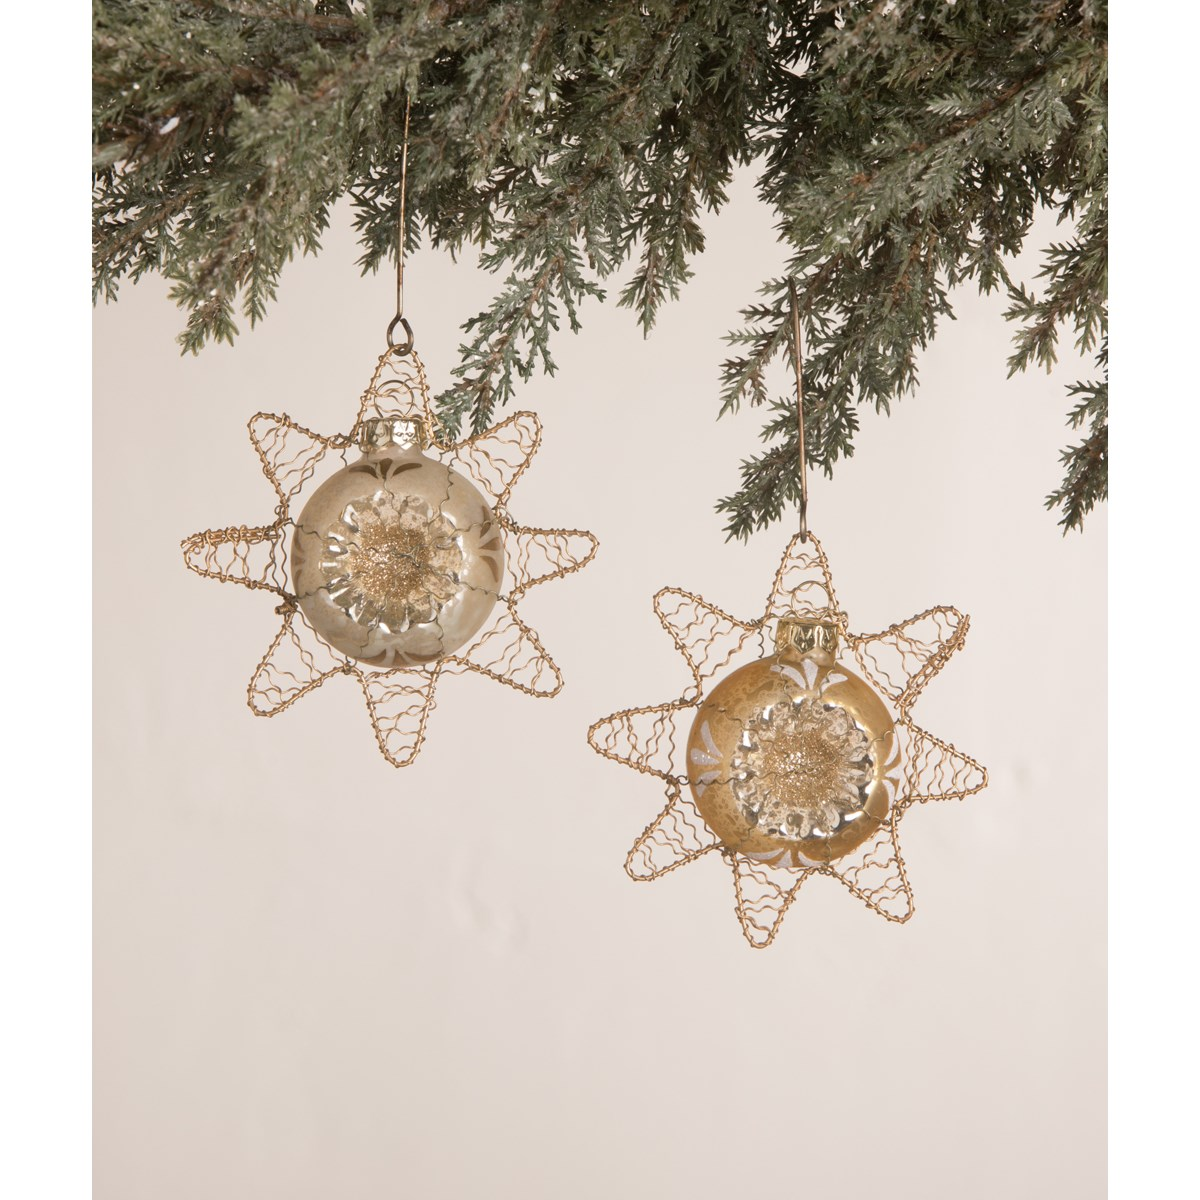 Peaceful Star Glass Ornament 2A